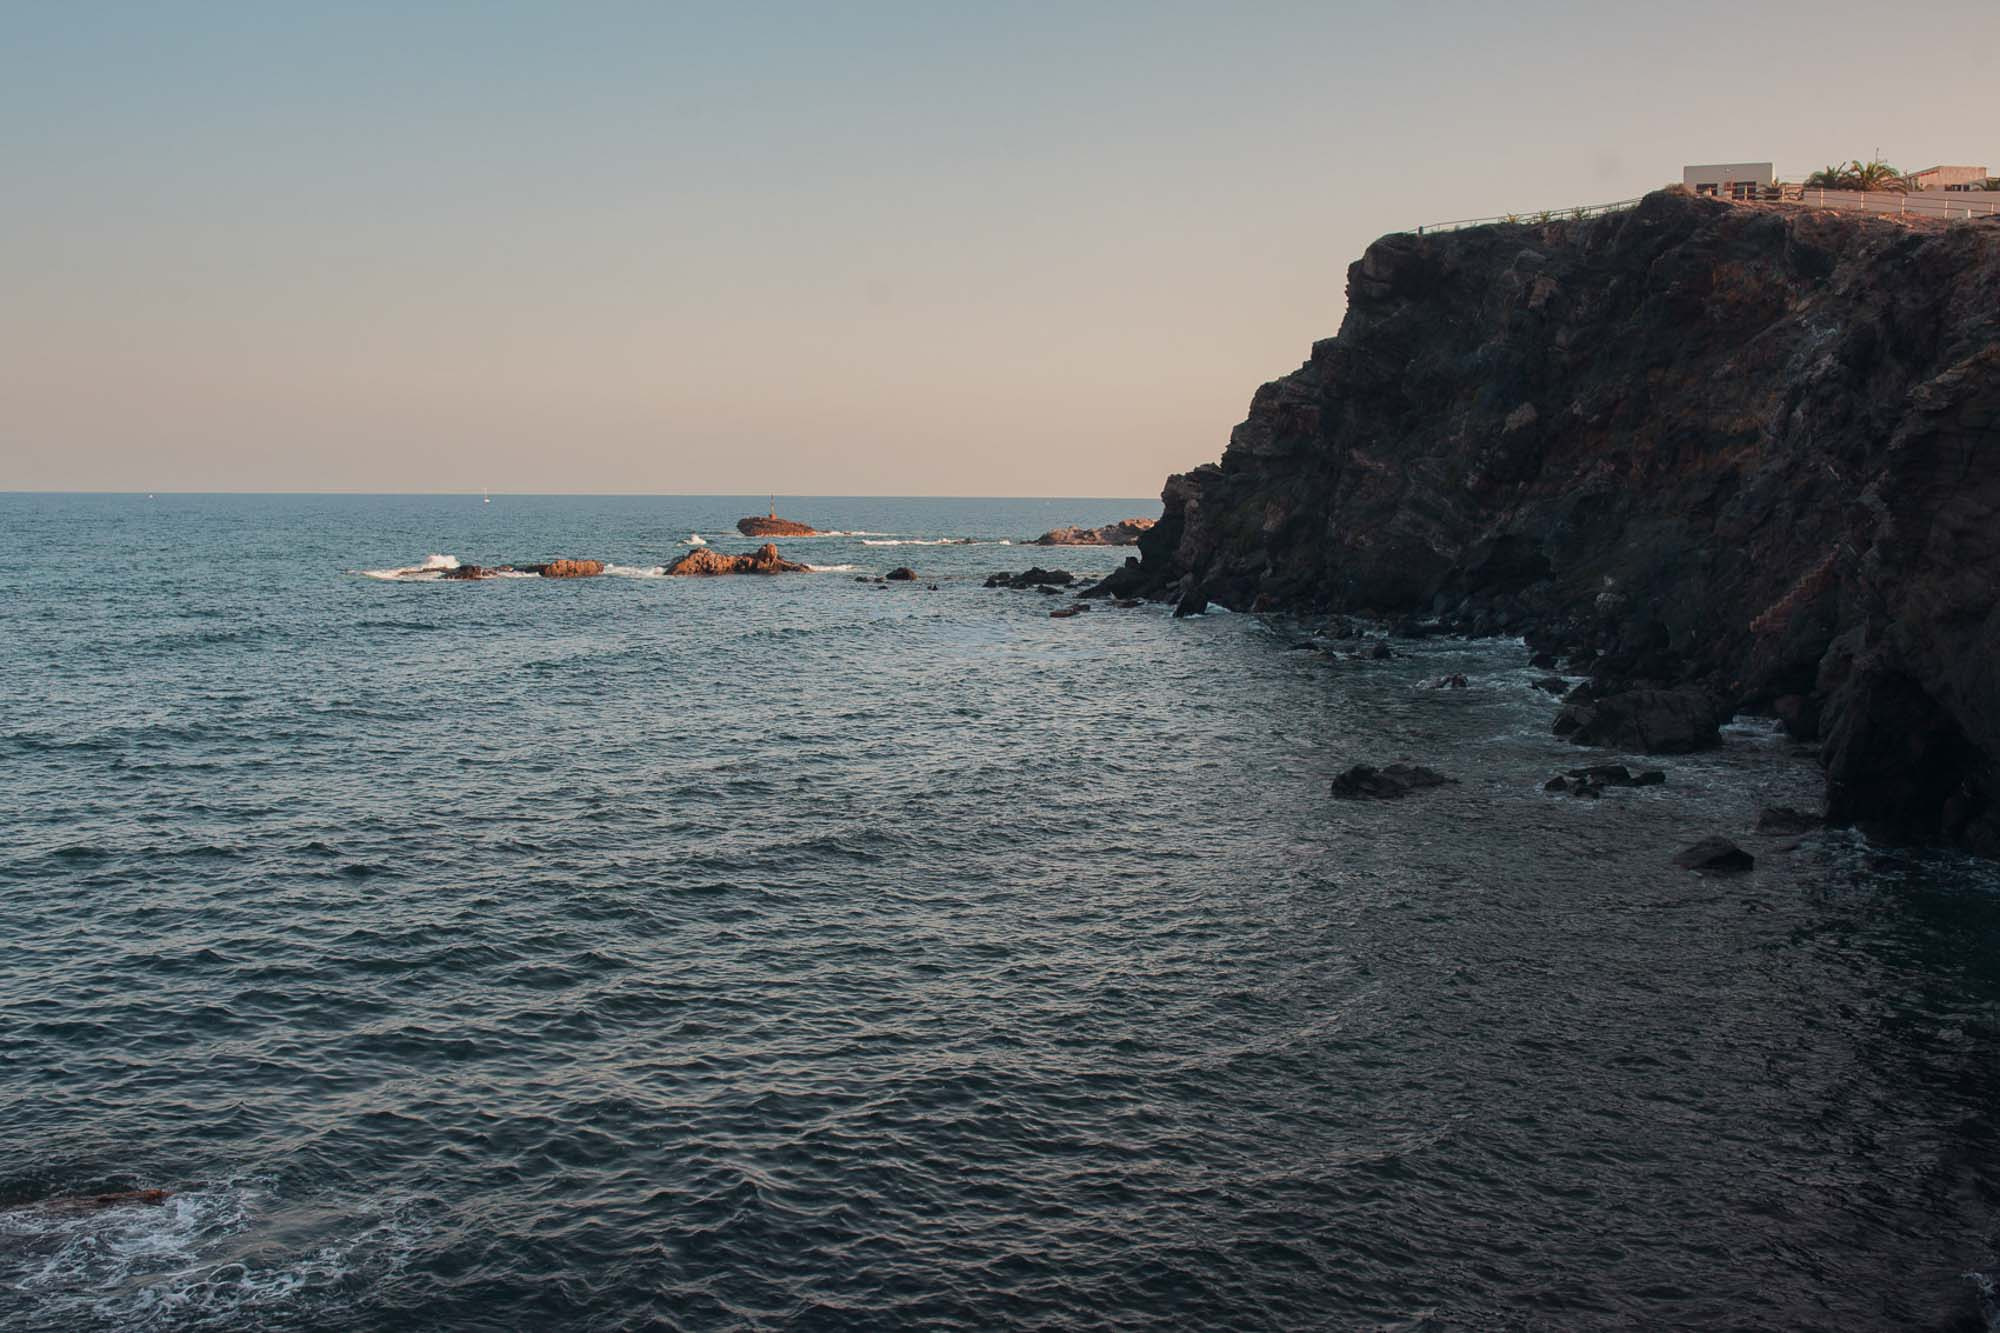 acantilado playa vistas cabo de palos mar rocas atardecer photography